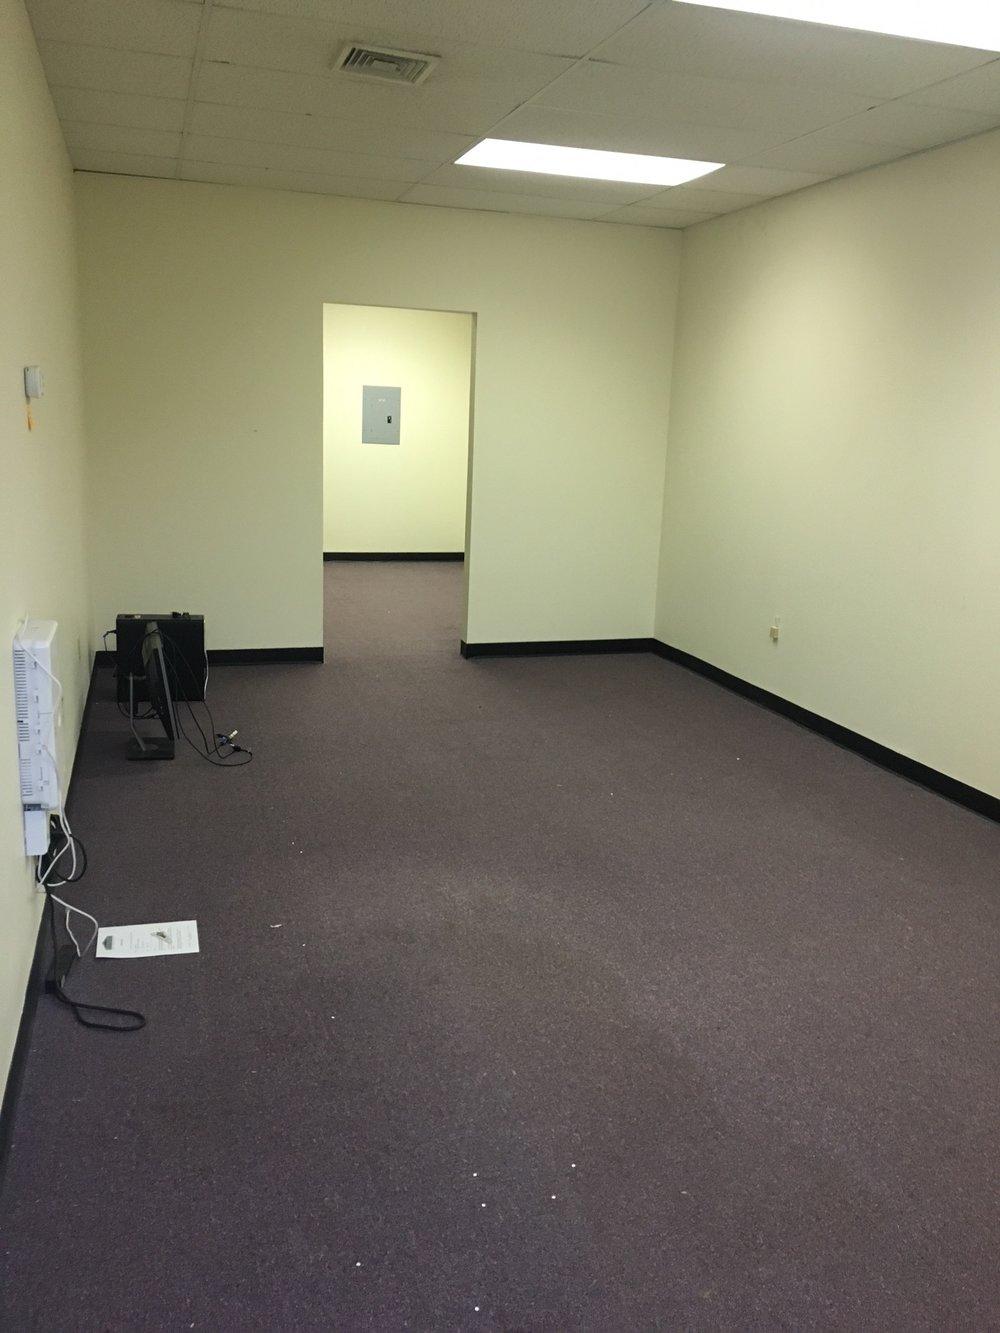 10-20 main vacant space 3.JPG